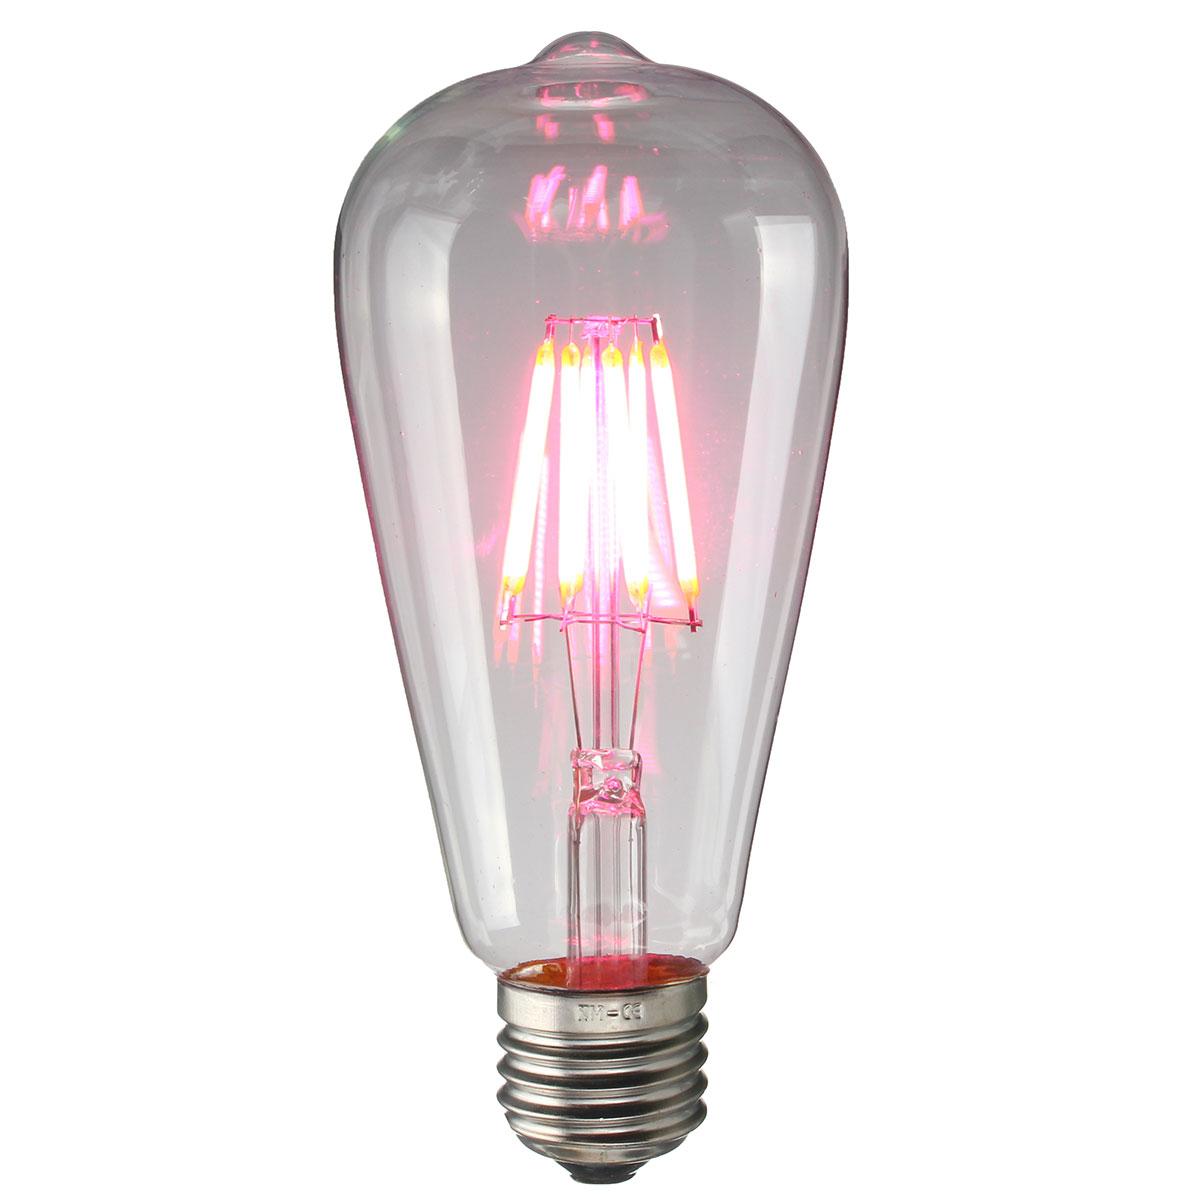 E27 ST64 8W RGB Edison Rereo Glass 800Lm Vintage Incandescent Light Lamp Bulb AC220V